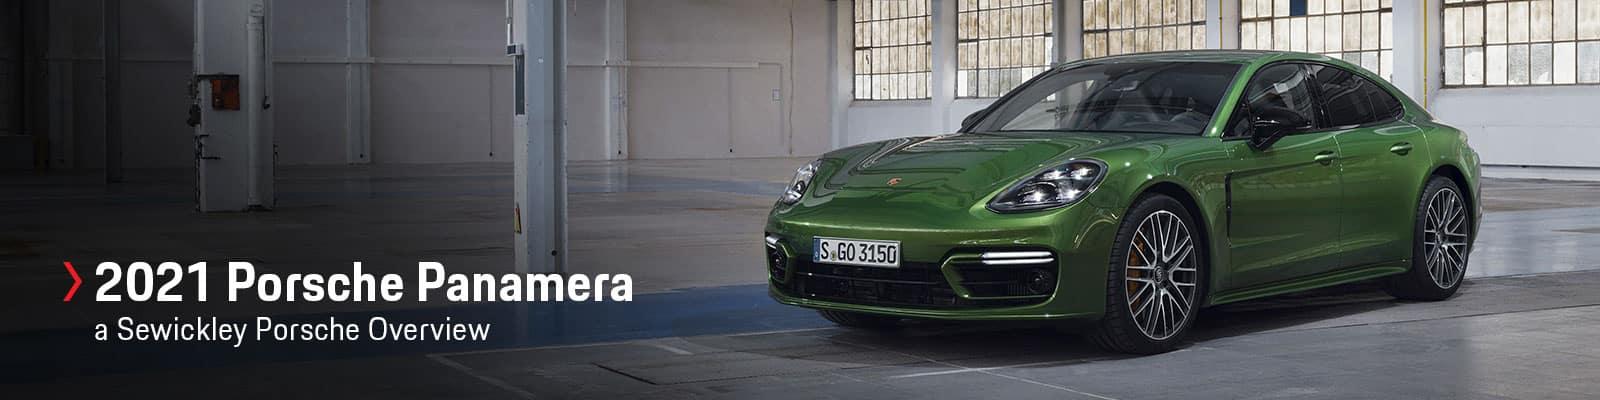 2020 Porsche Panamera Model Review at Sewickley Porsche